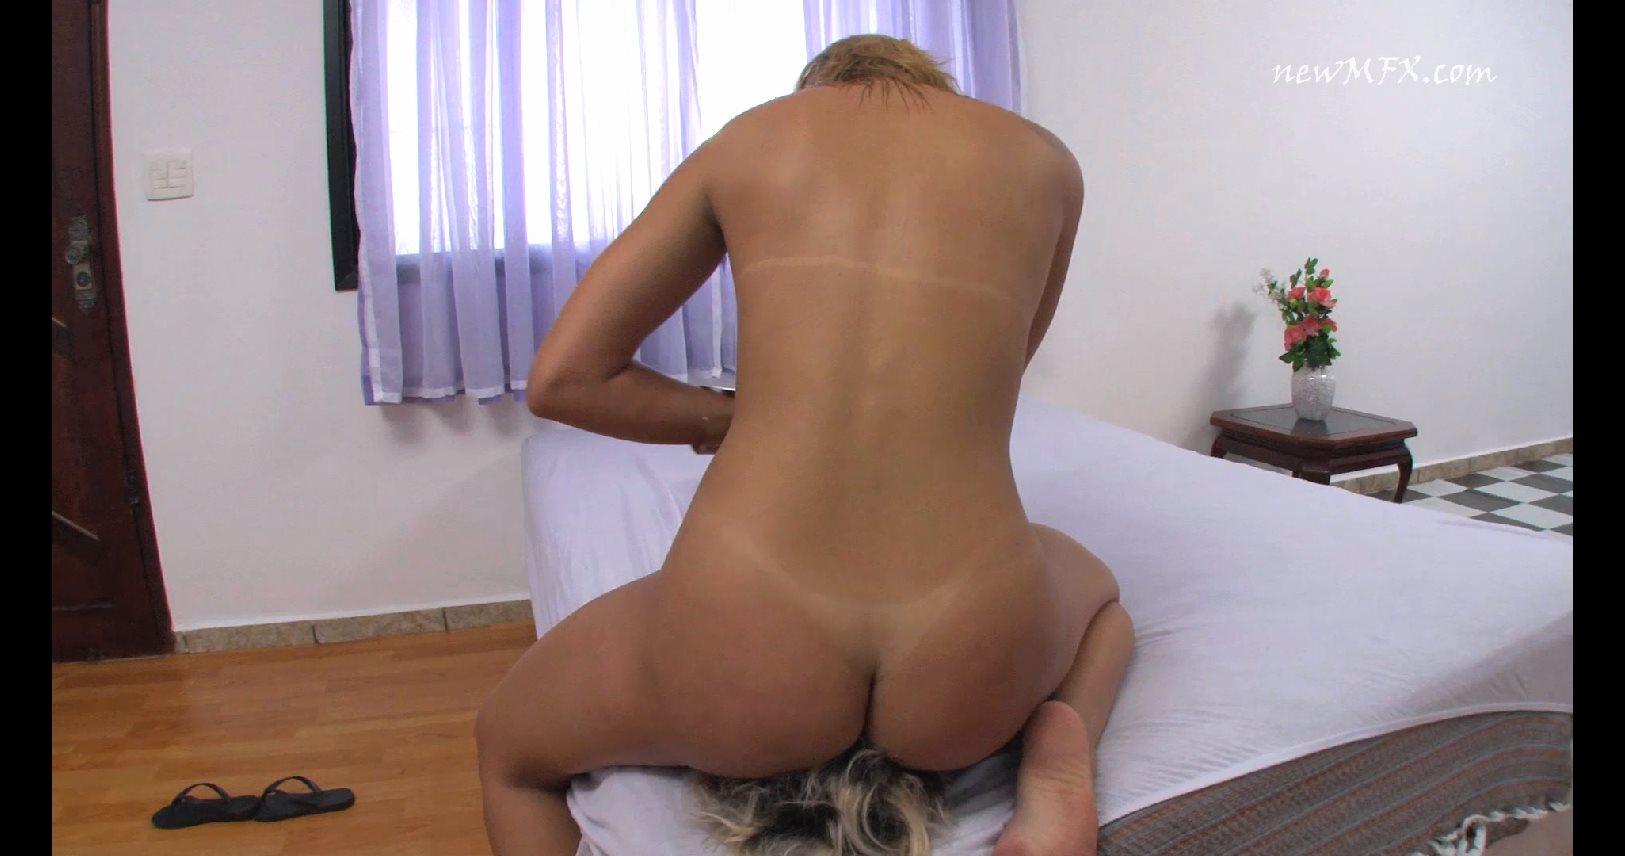 Cindy Blueberry, Tati In Scene: First Cindy's Cruel Facesitting Fuck Face - FACESITTING IN BRAZIL / NEW MFX - FULL HD/1080p/MP4